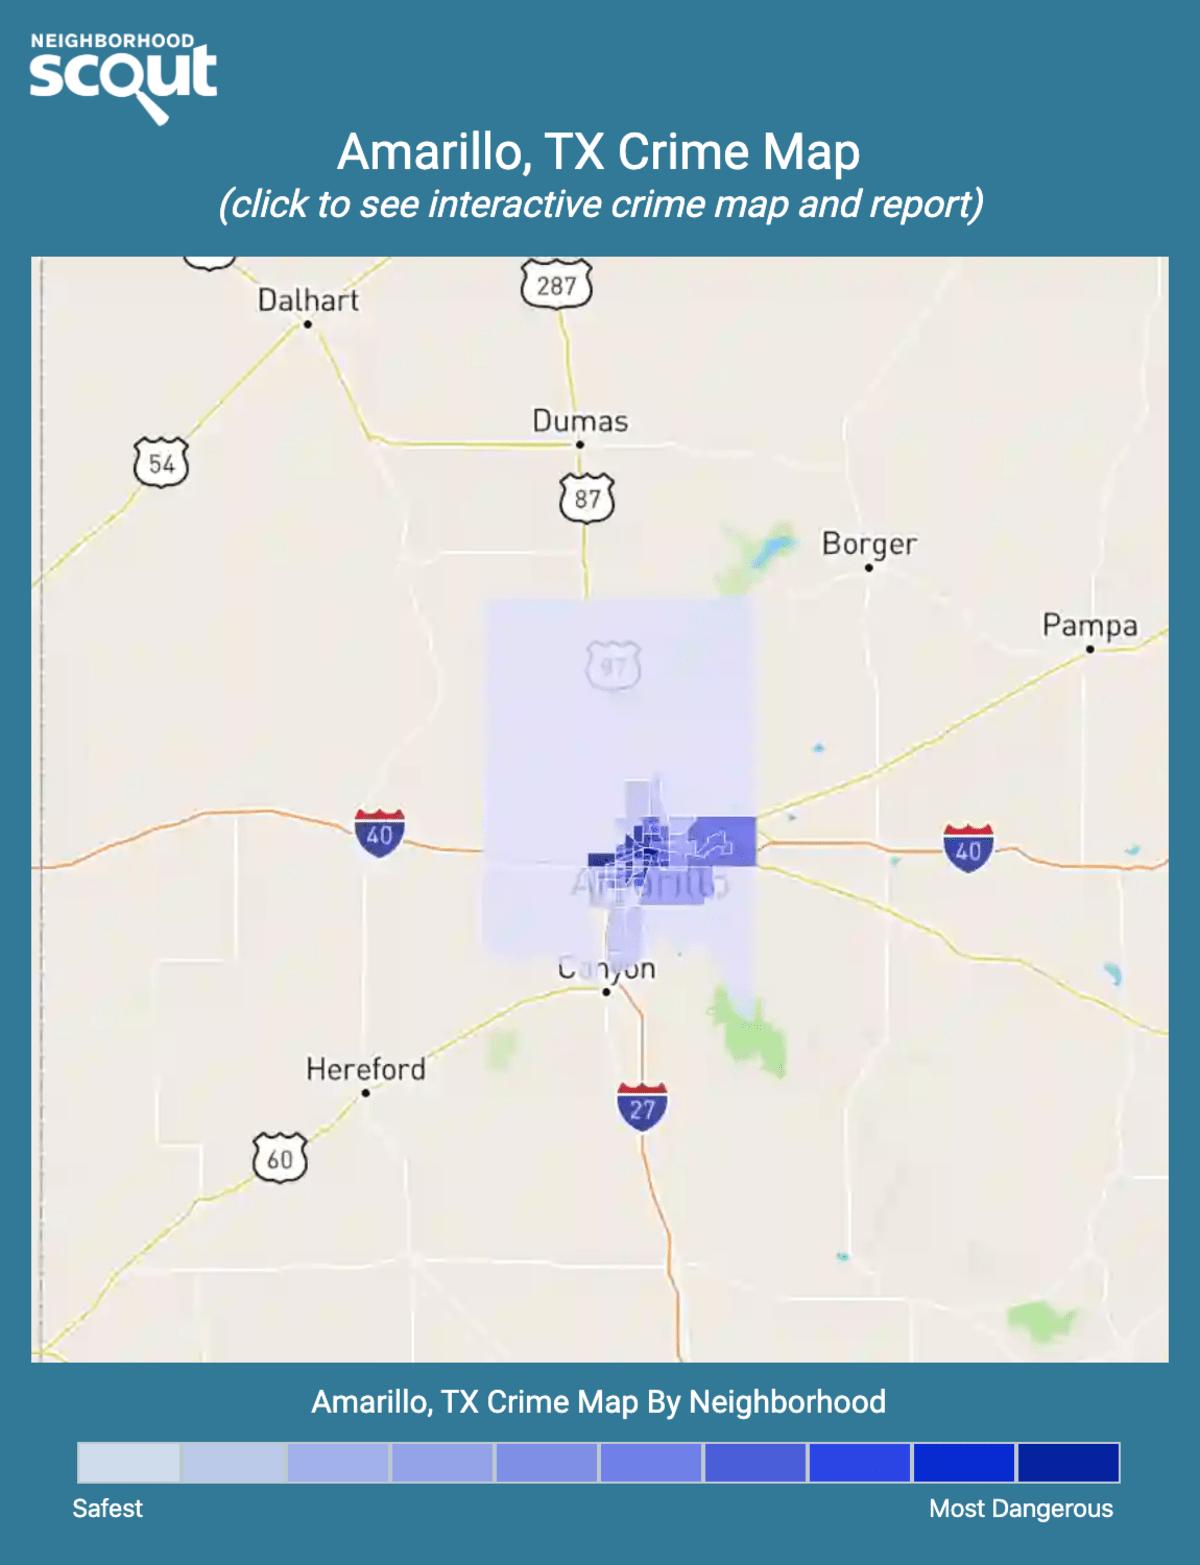 Amarillo Zip Code Map : amarillo, Amarillo, Crime, Rates, Statistics, NeighborhoodScout